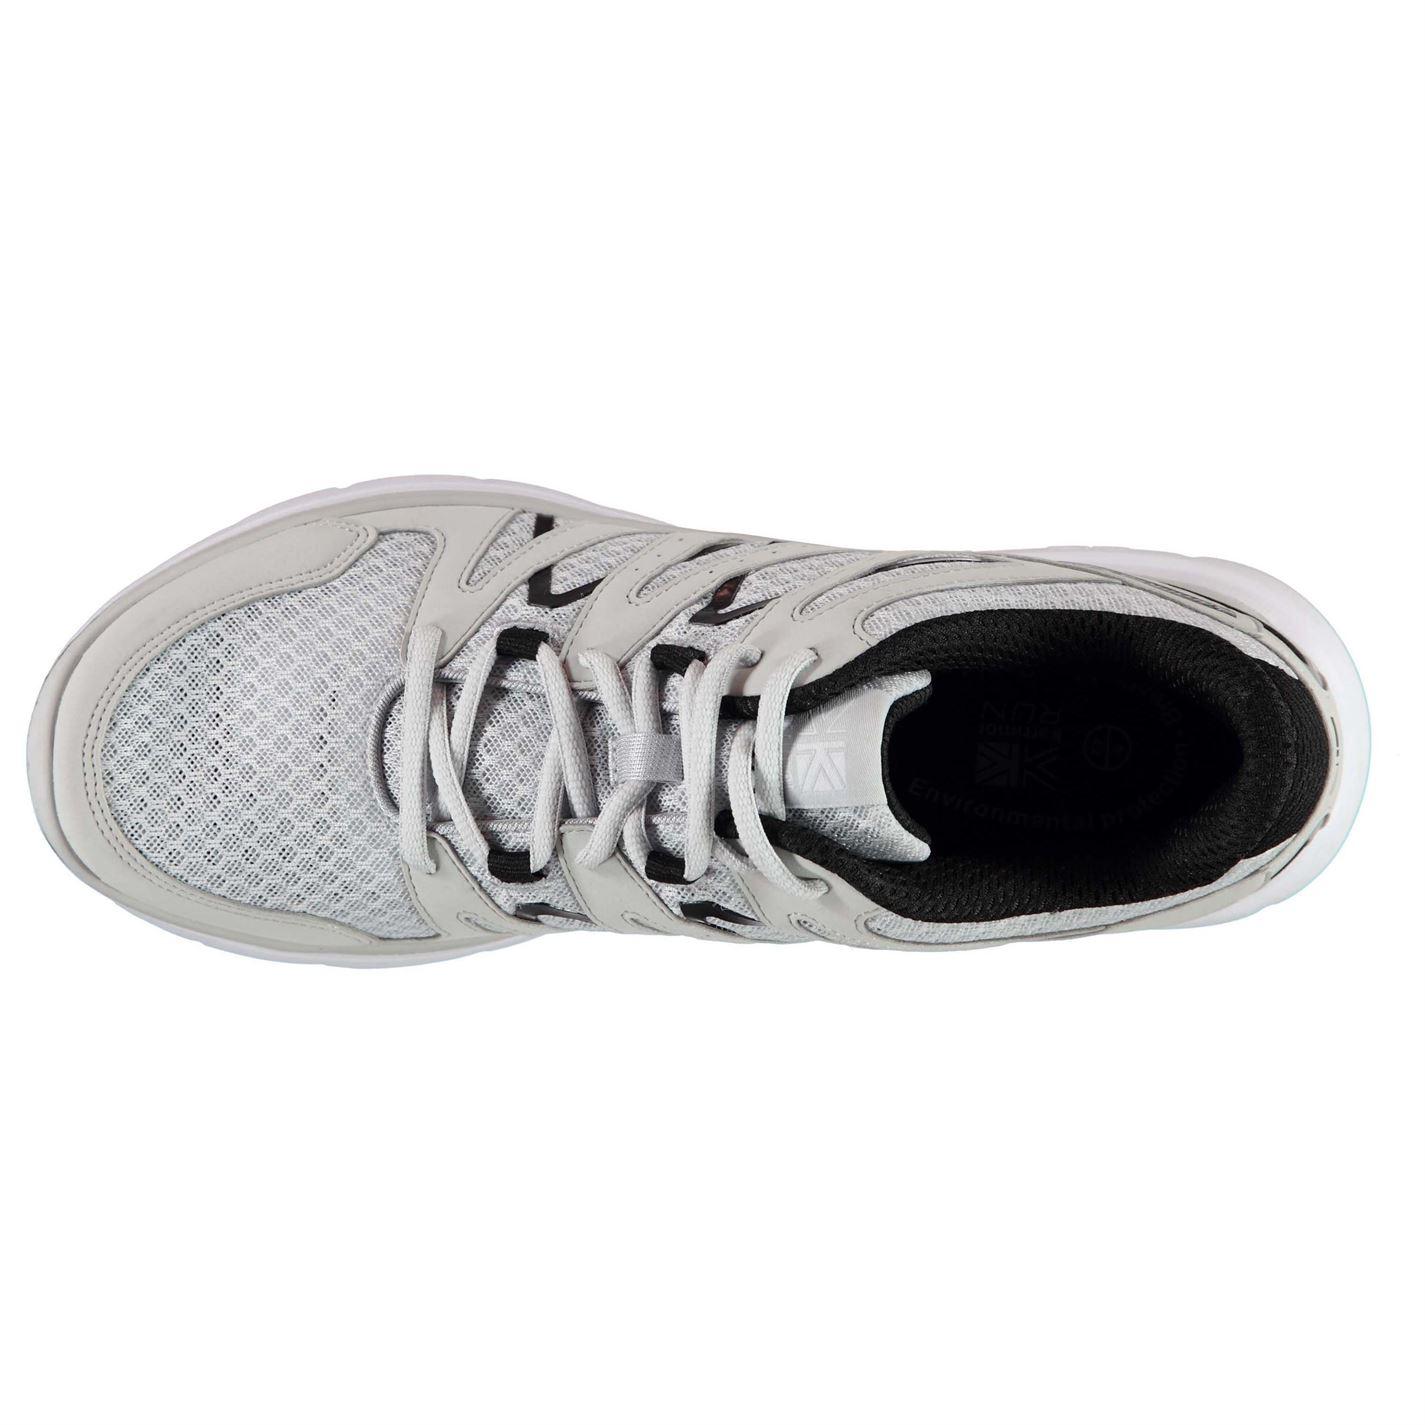 Karrimor-Mens-Duma-Trainers-Lace-Up-Sports-Running-Cross-Training-Shoes thumbnail 48